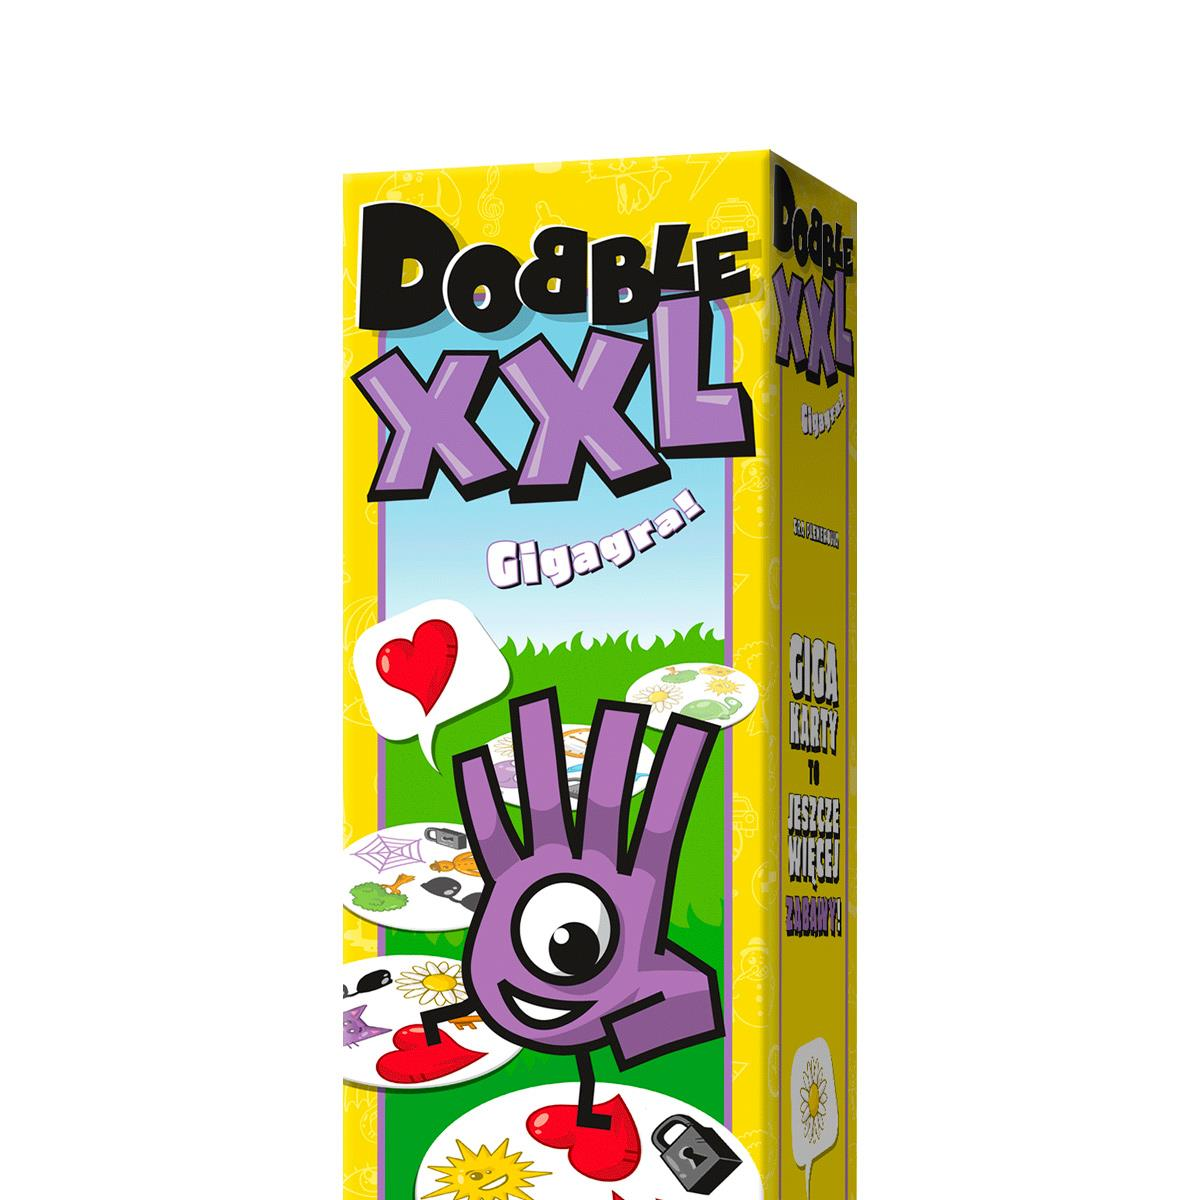 Dobble XXL